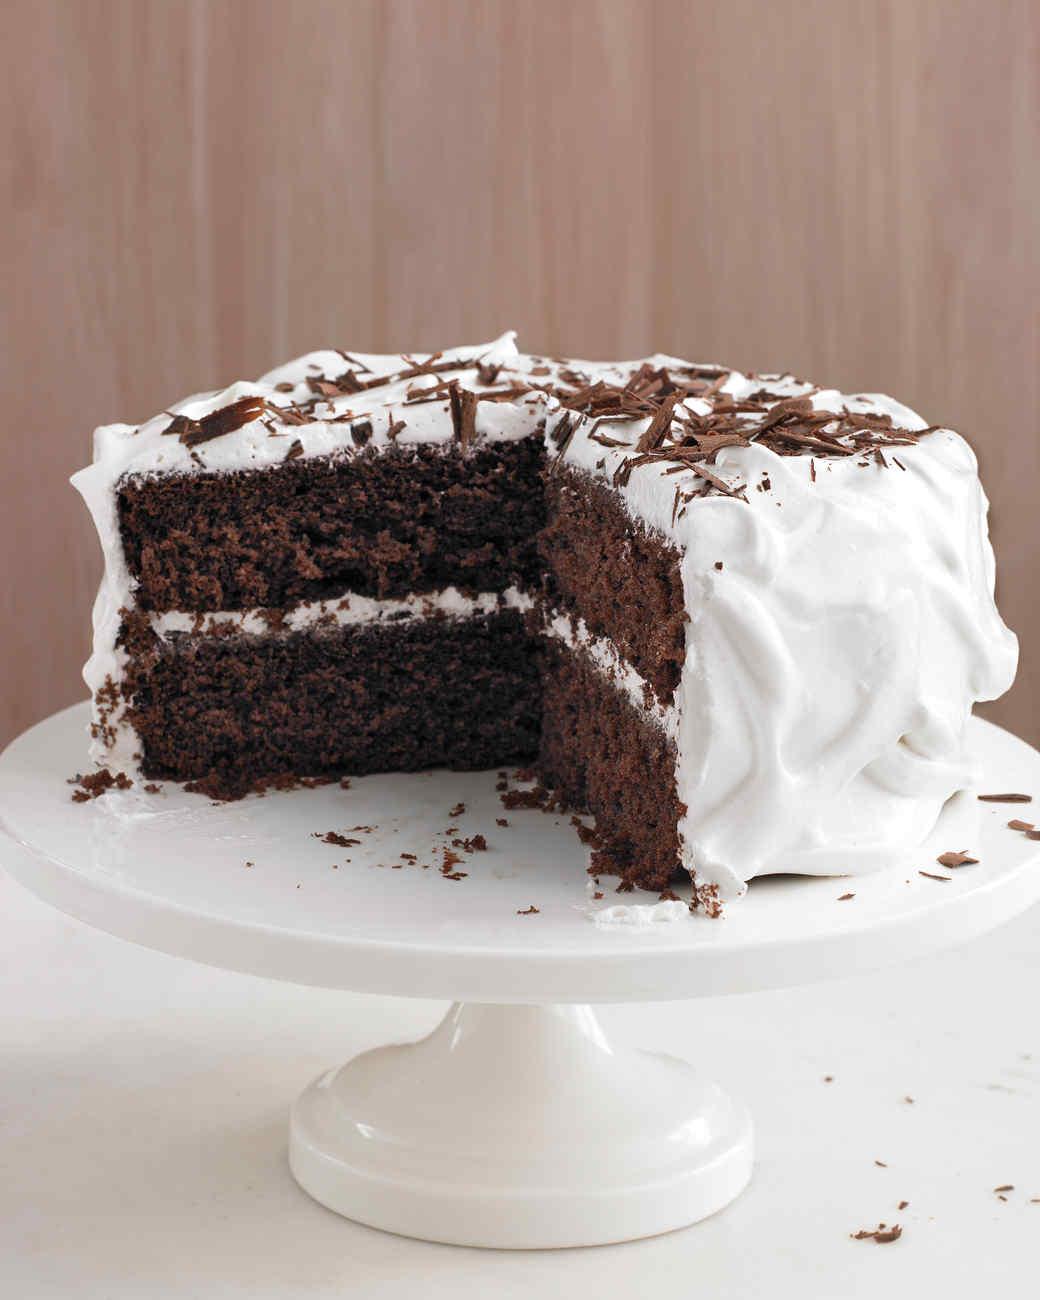 Martha stewart chocolate mousse cake recipe